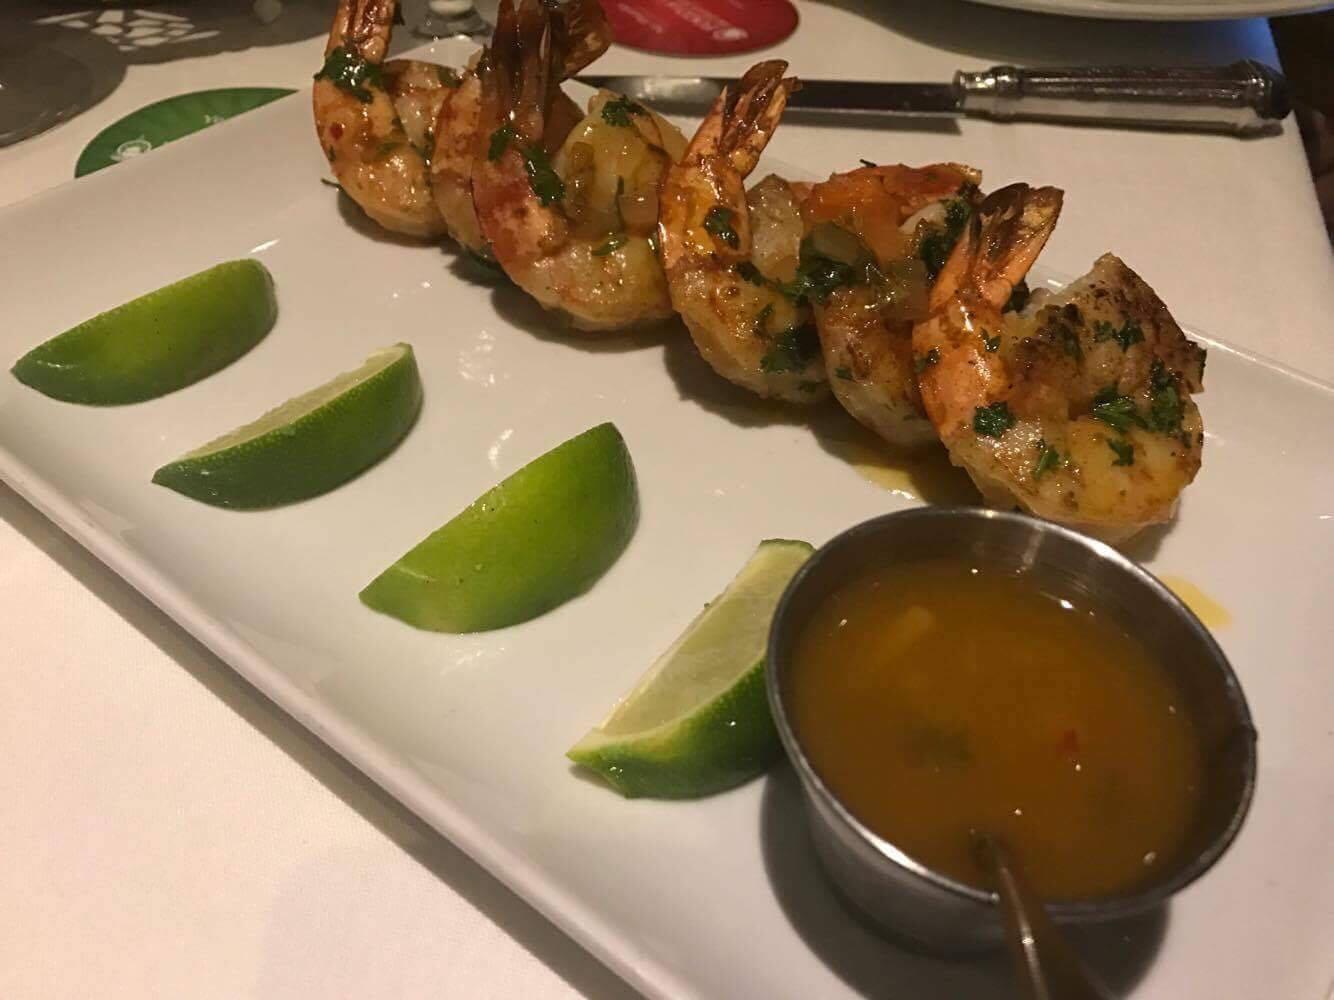 Military travels fogo de ch o brazilian restaurant in for Restaurants that offer military discount